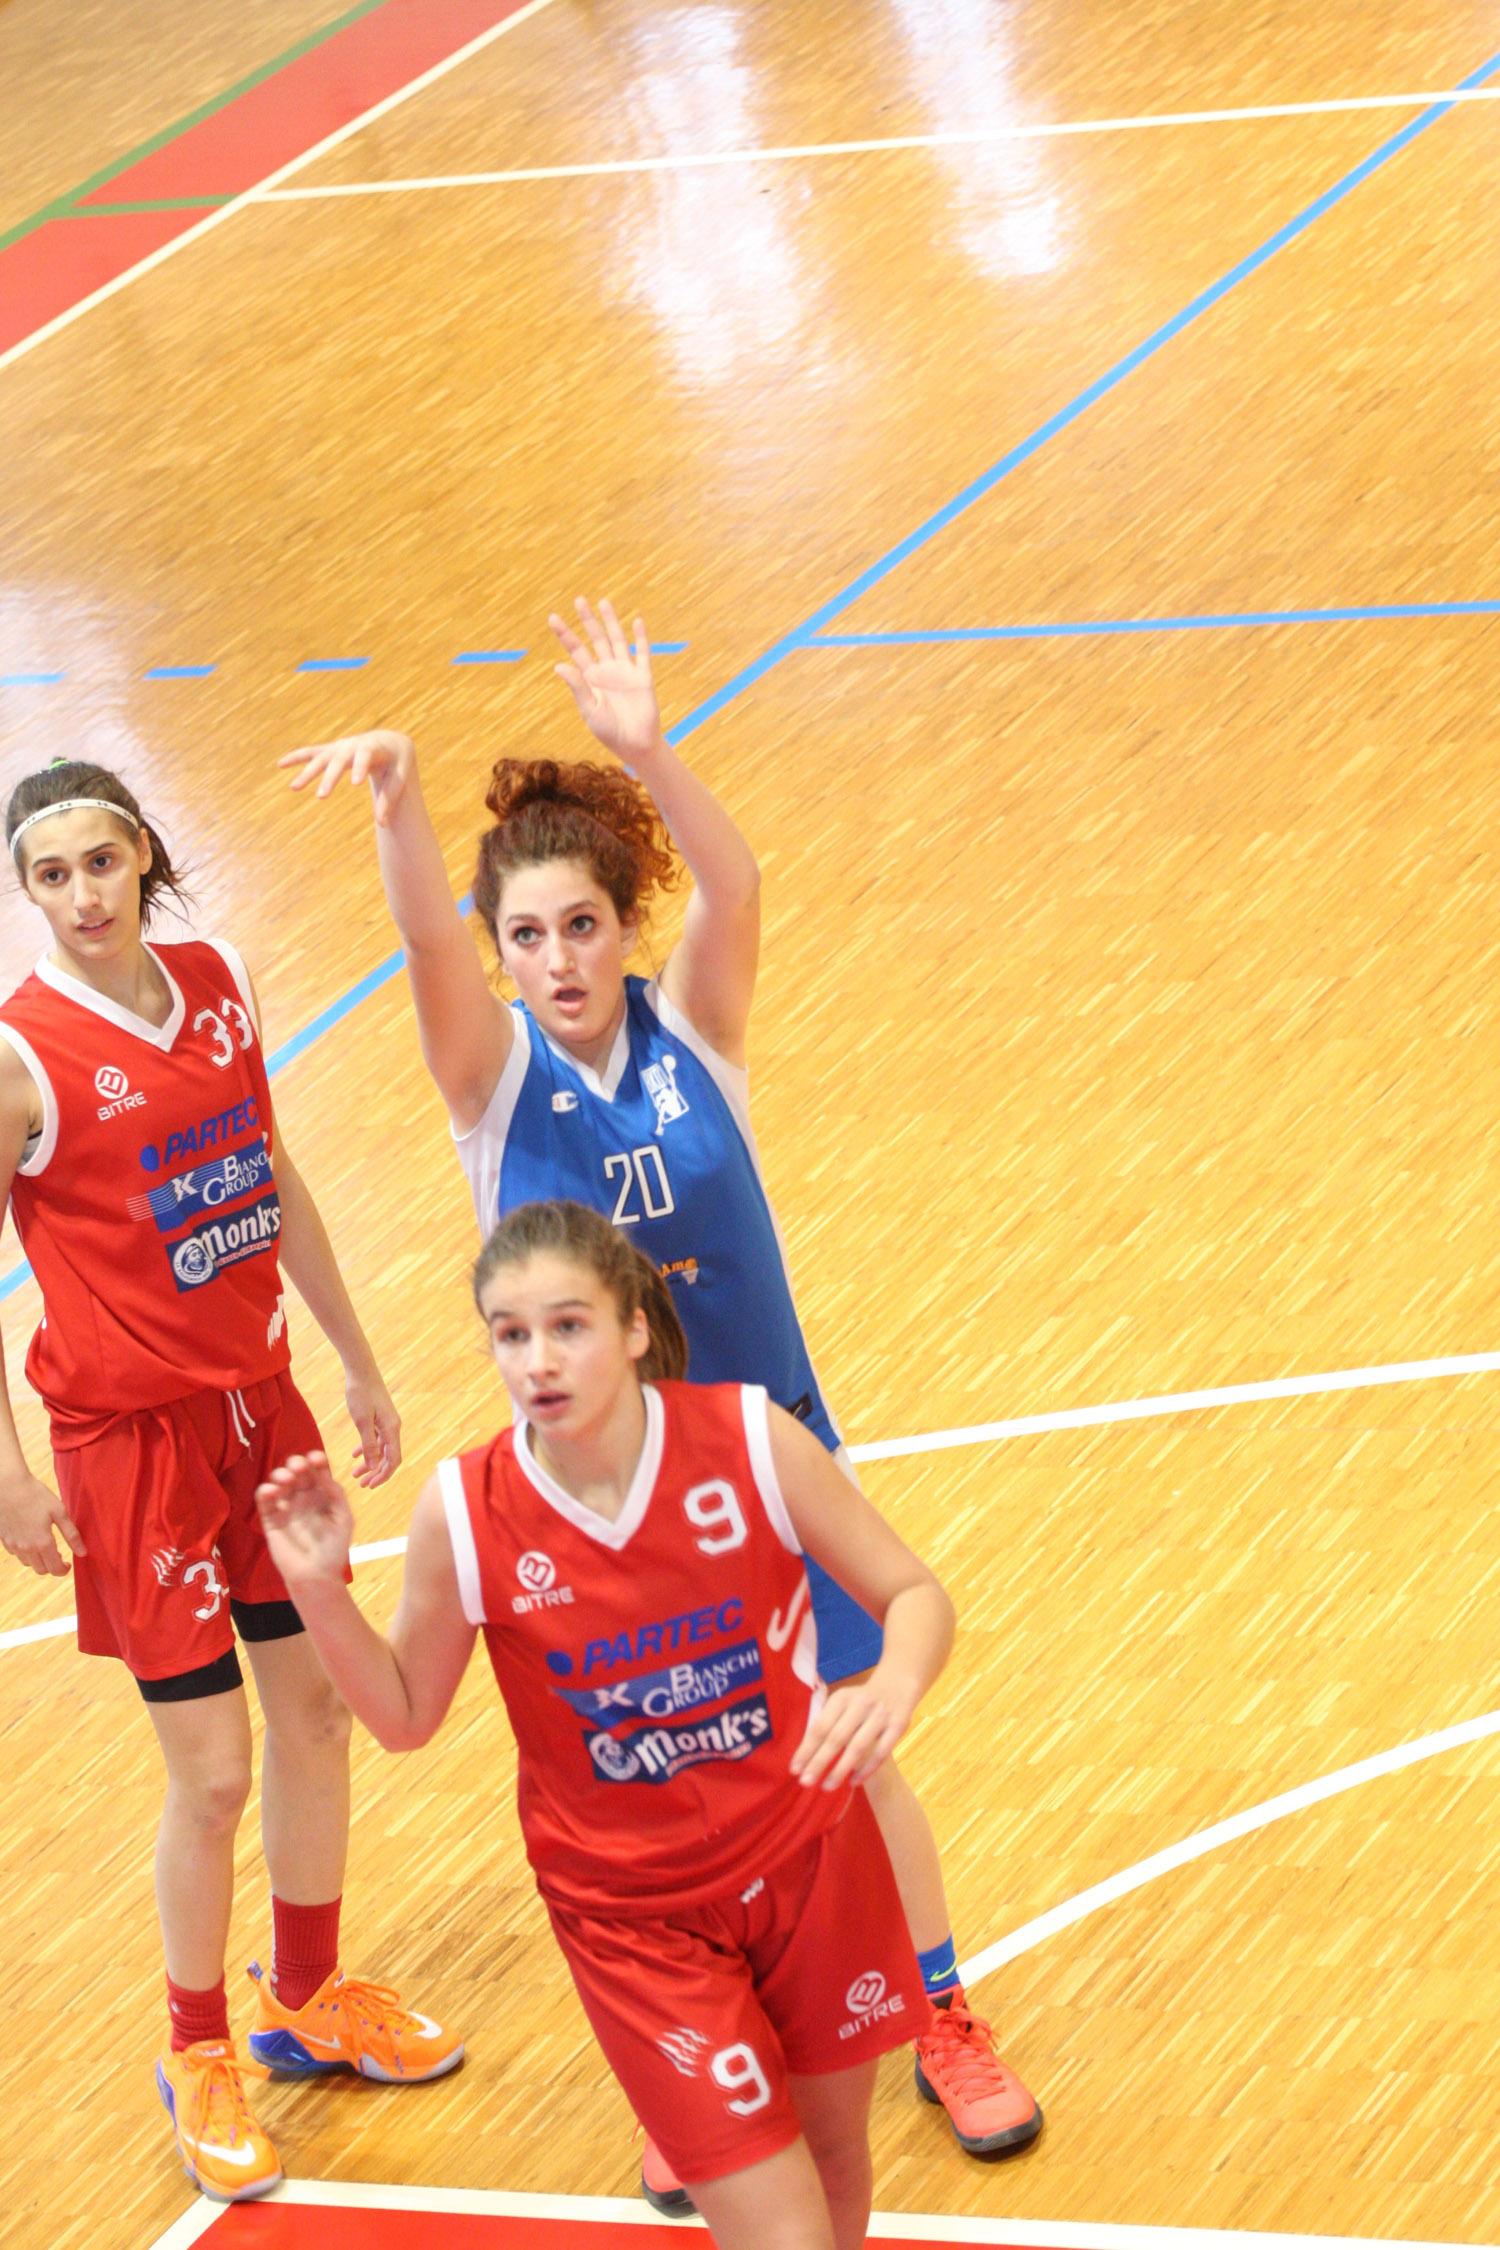 U16E - Costa Masnaga vs Baskettiamo Vittuone 2001 00032.jpg